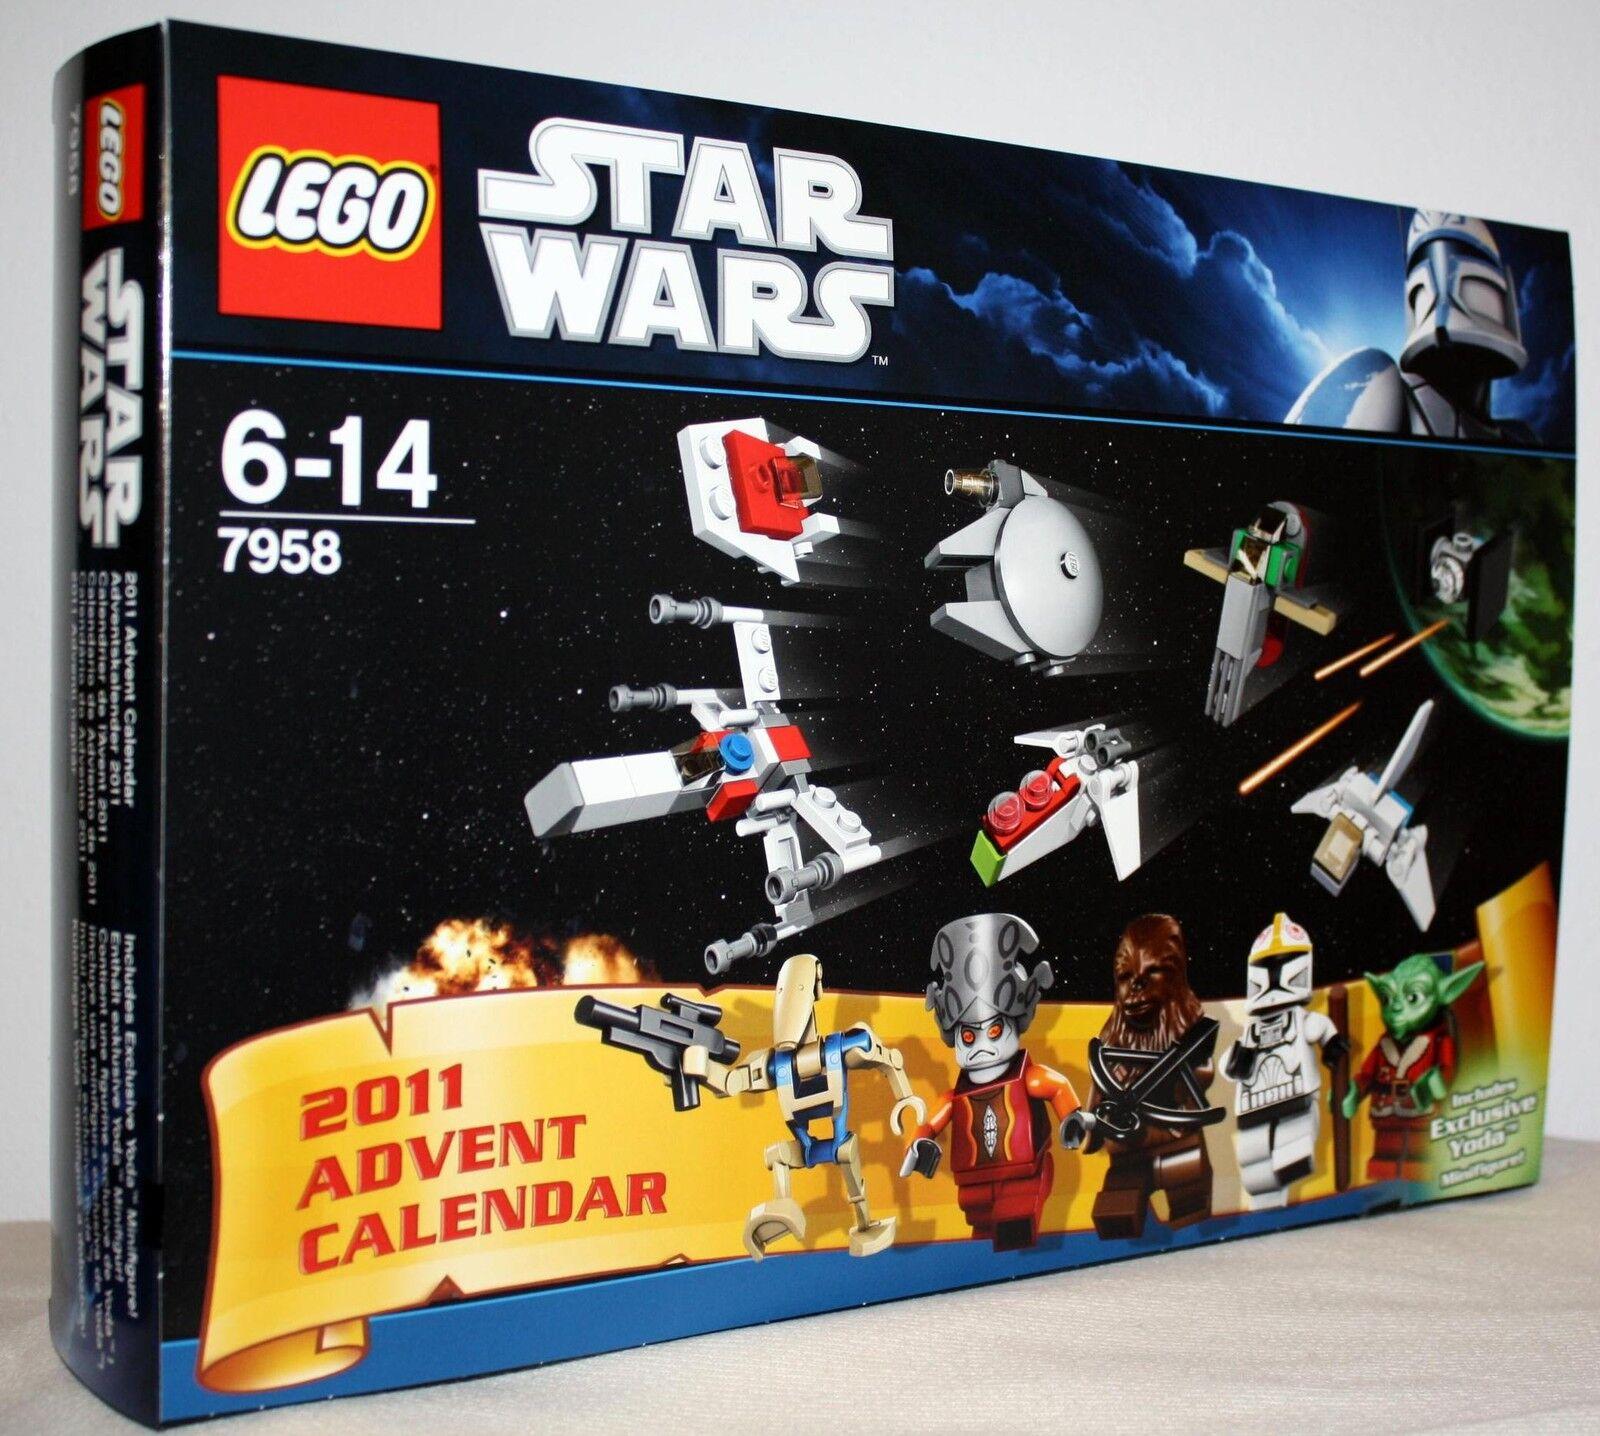 LEGO® 7958 Star Wars Adventskalender 2011 Neu & OVP  | Überlegene Qualität